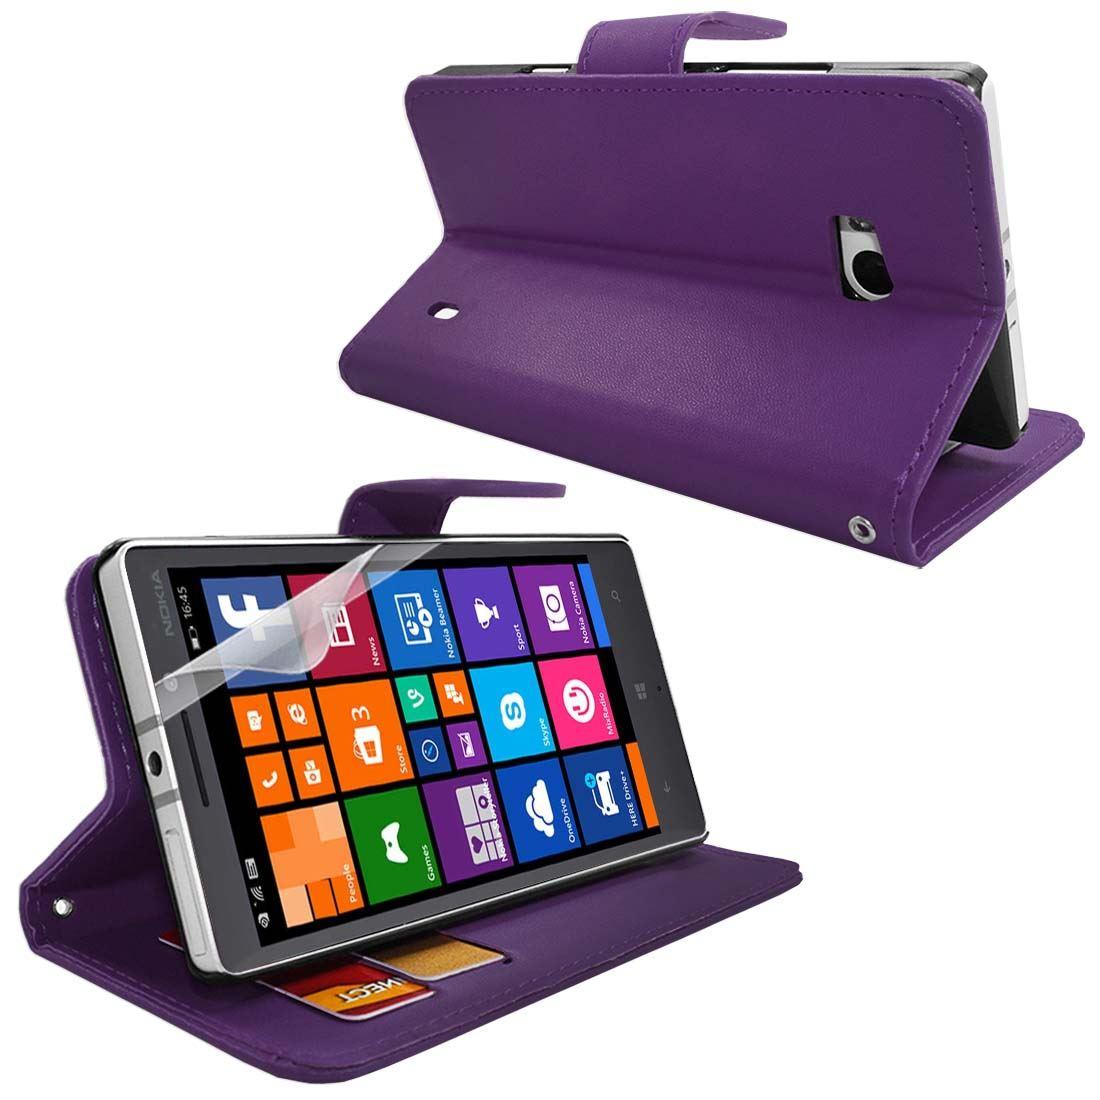 Custodia Portafoglio in PU pelle laterali Flip Stand Nokia Lumia 930 + pellicola